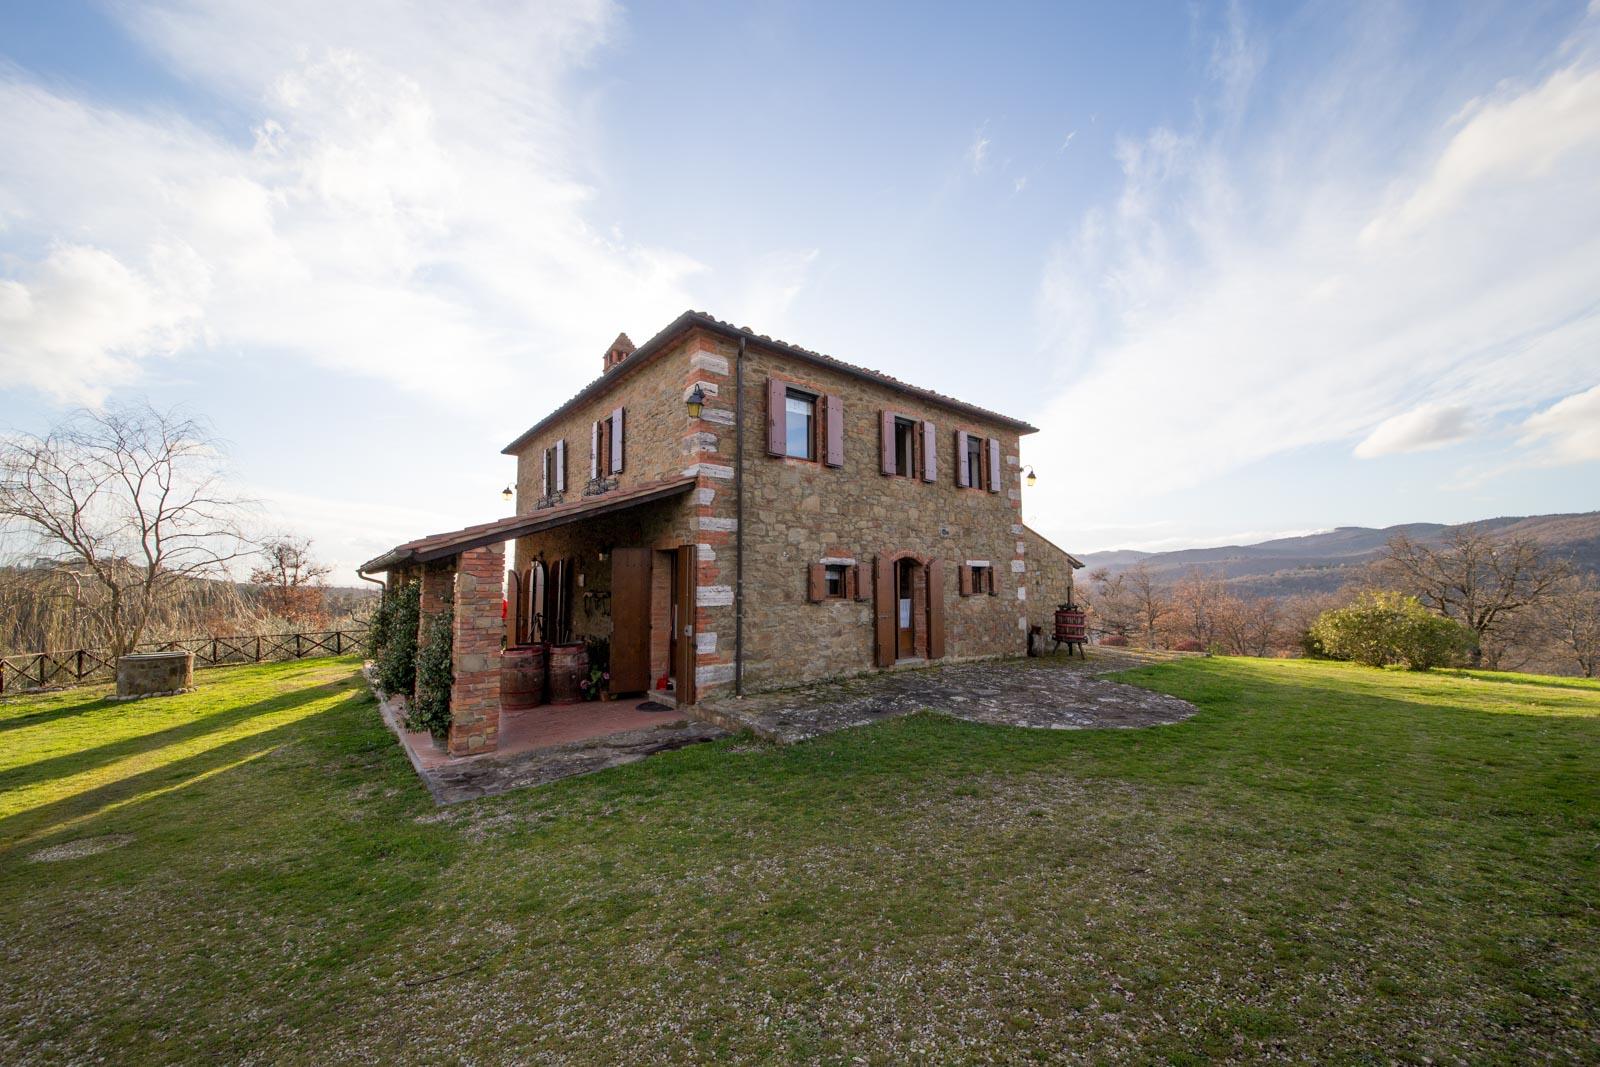 landhaus kaufen verkaufen in italien toskana arezzo